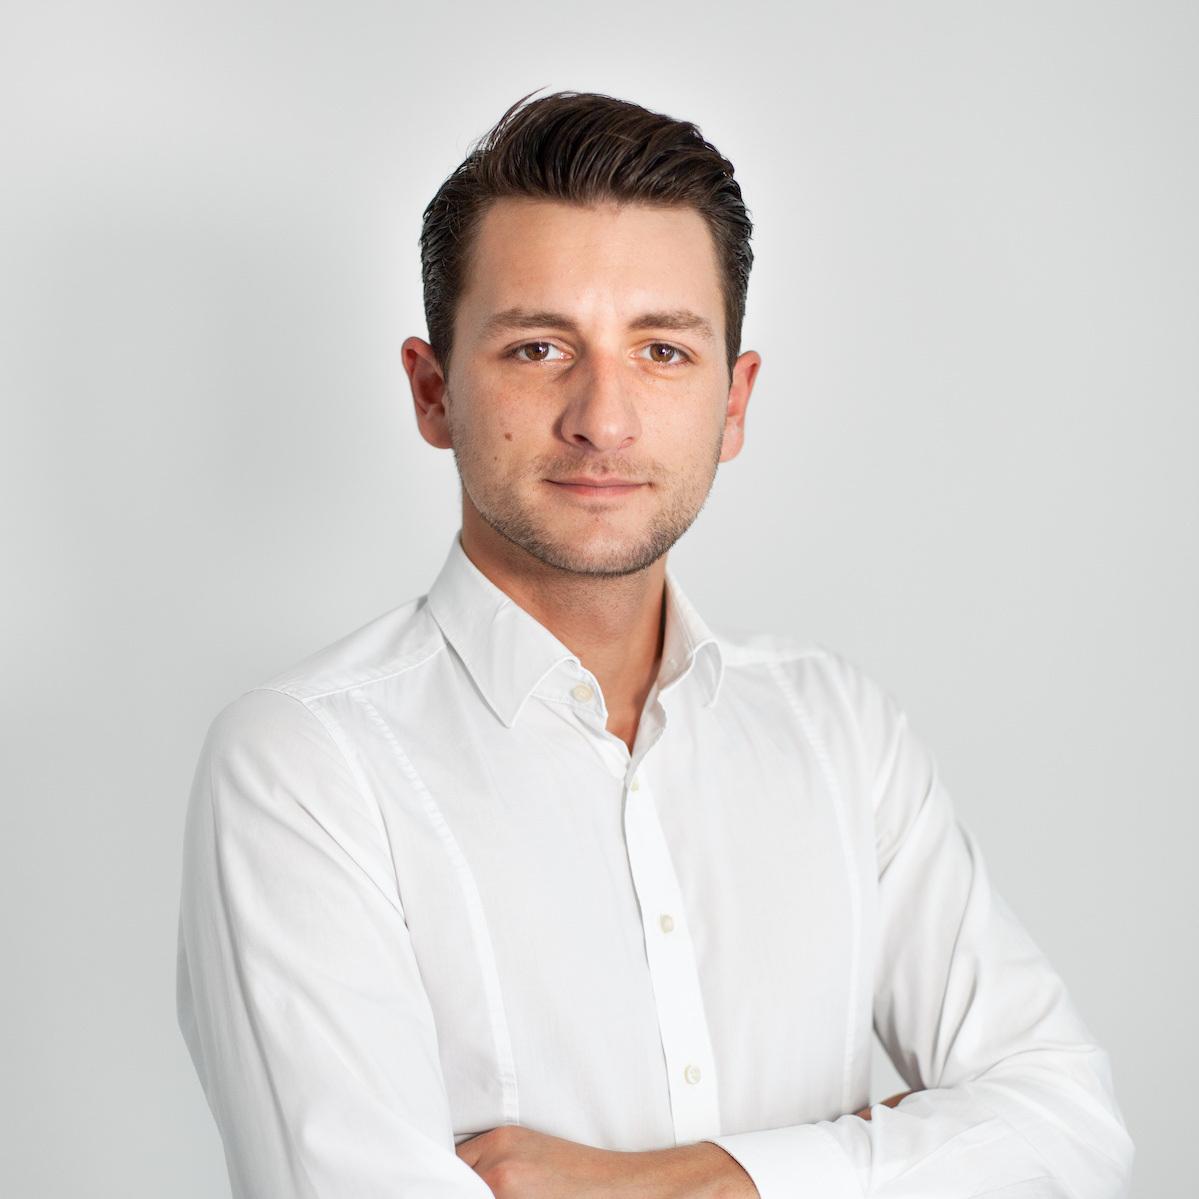 ALBINSINANI - Head of Marketing